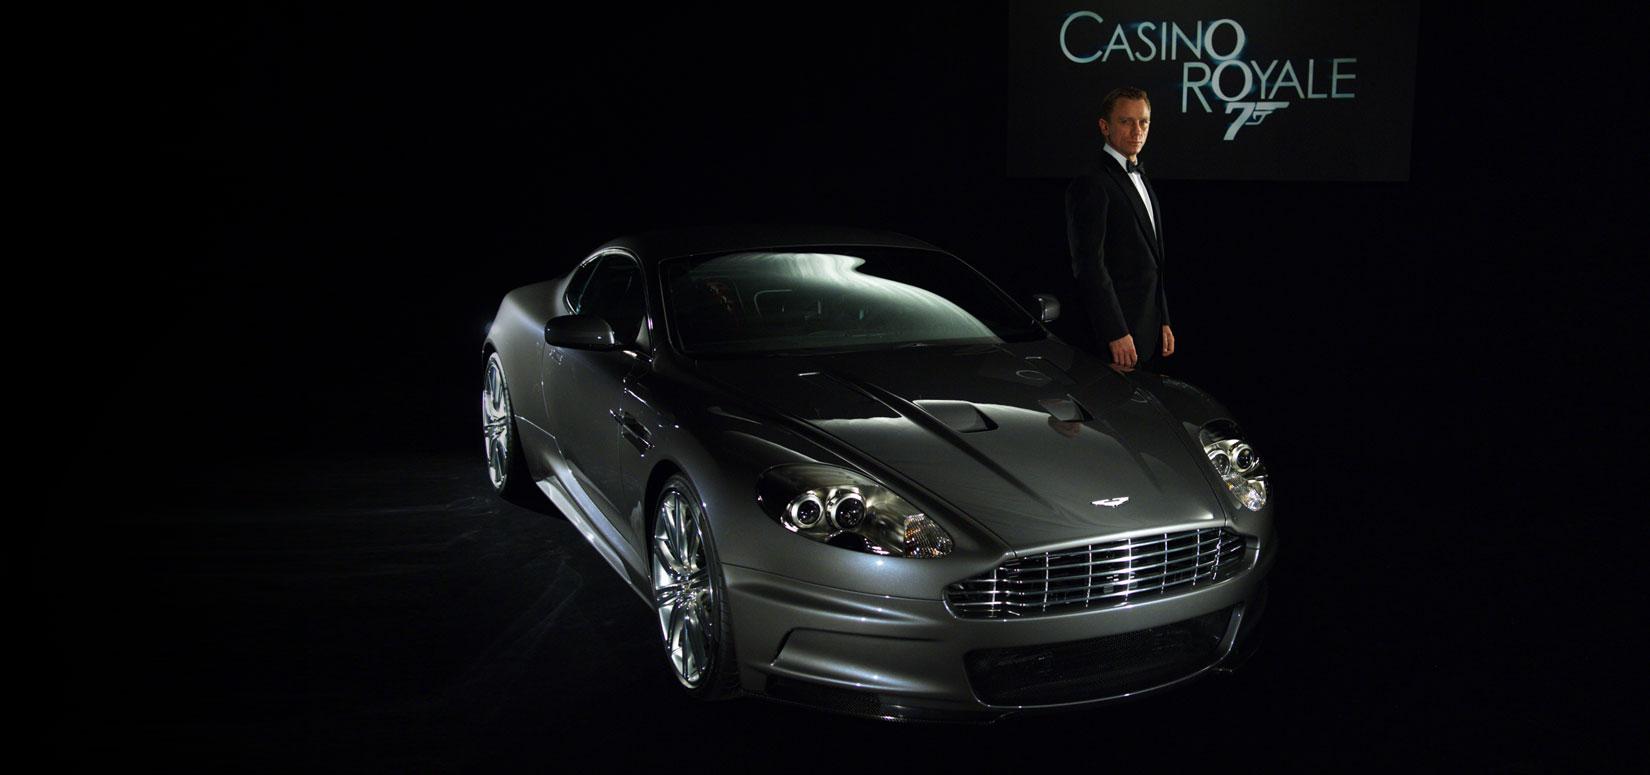 Aston Martin Db9 James Bond Pakwheels Blog